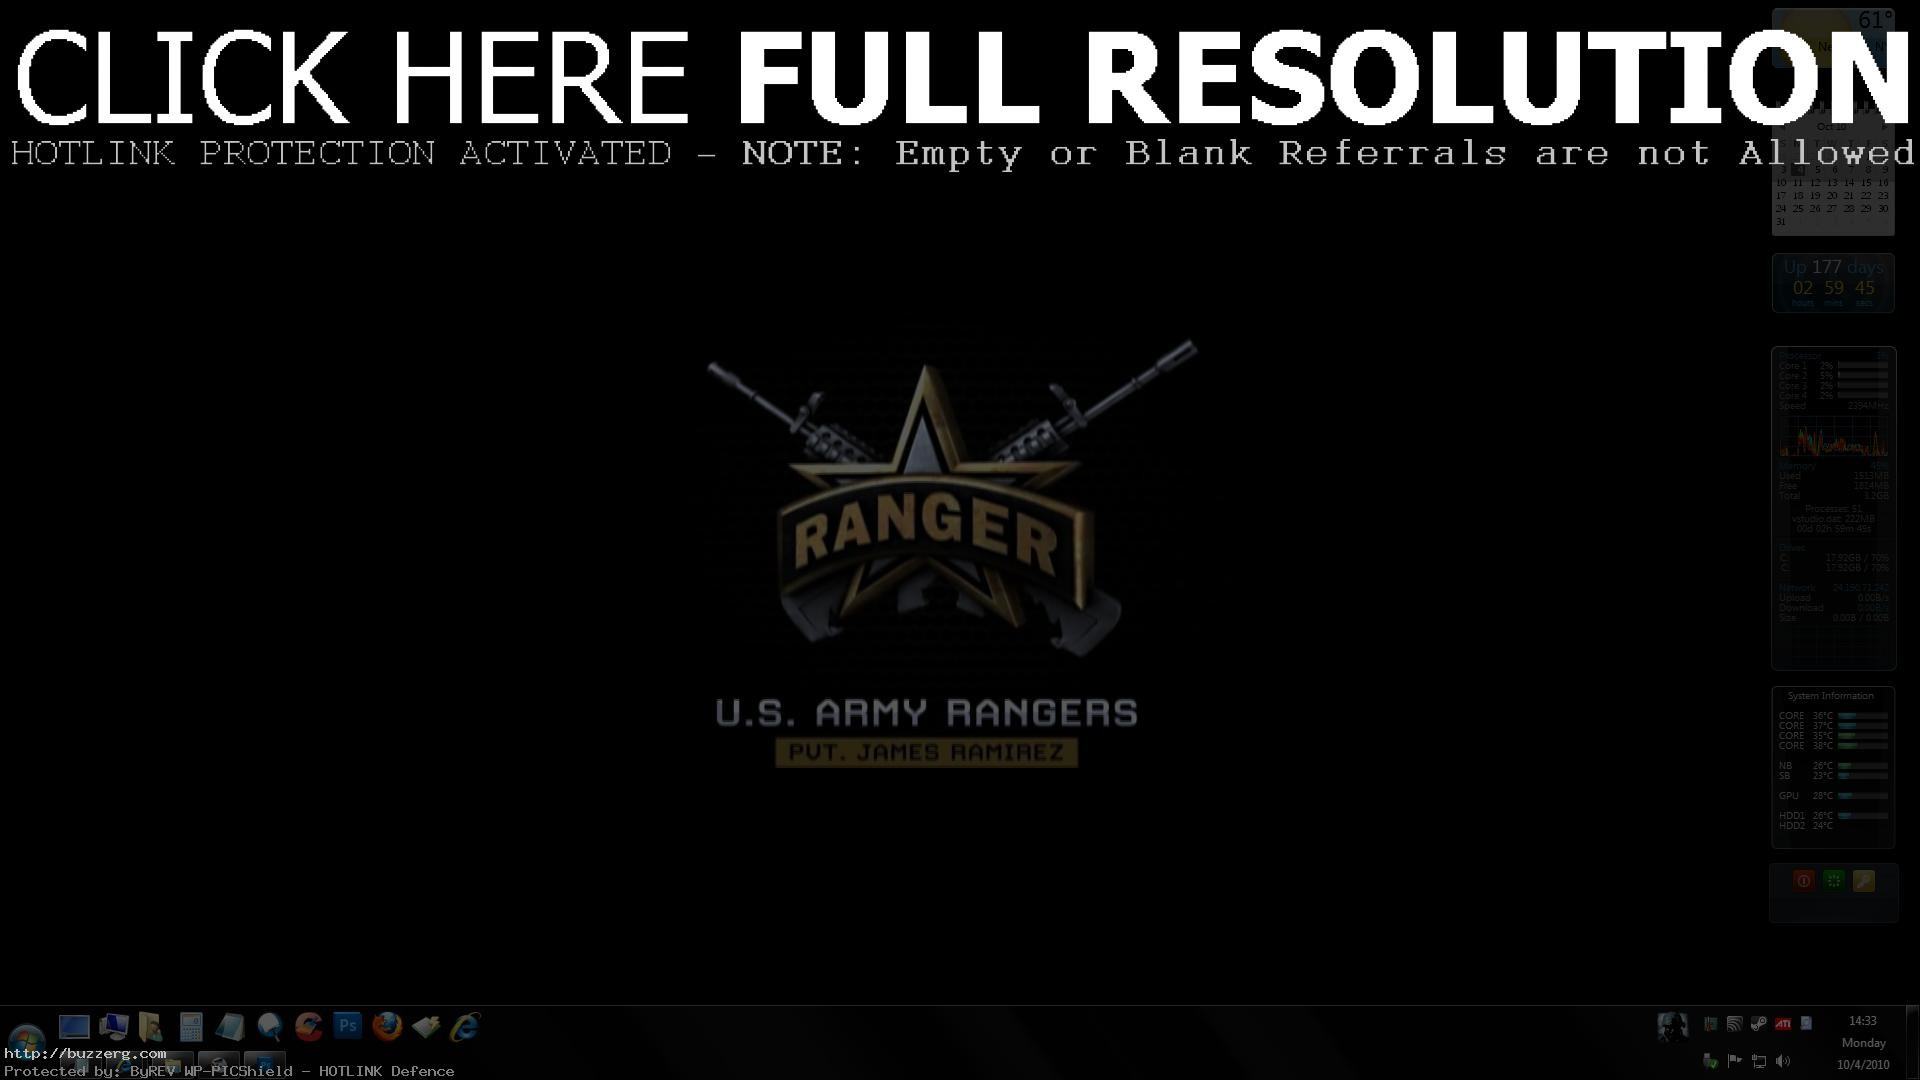 Army Ranger (id: 168358)